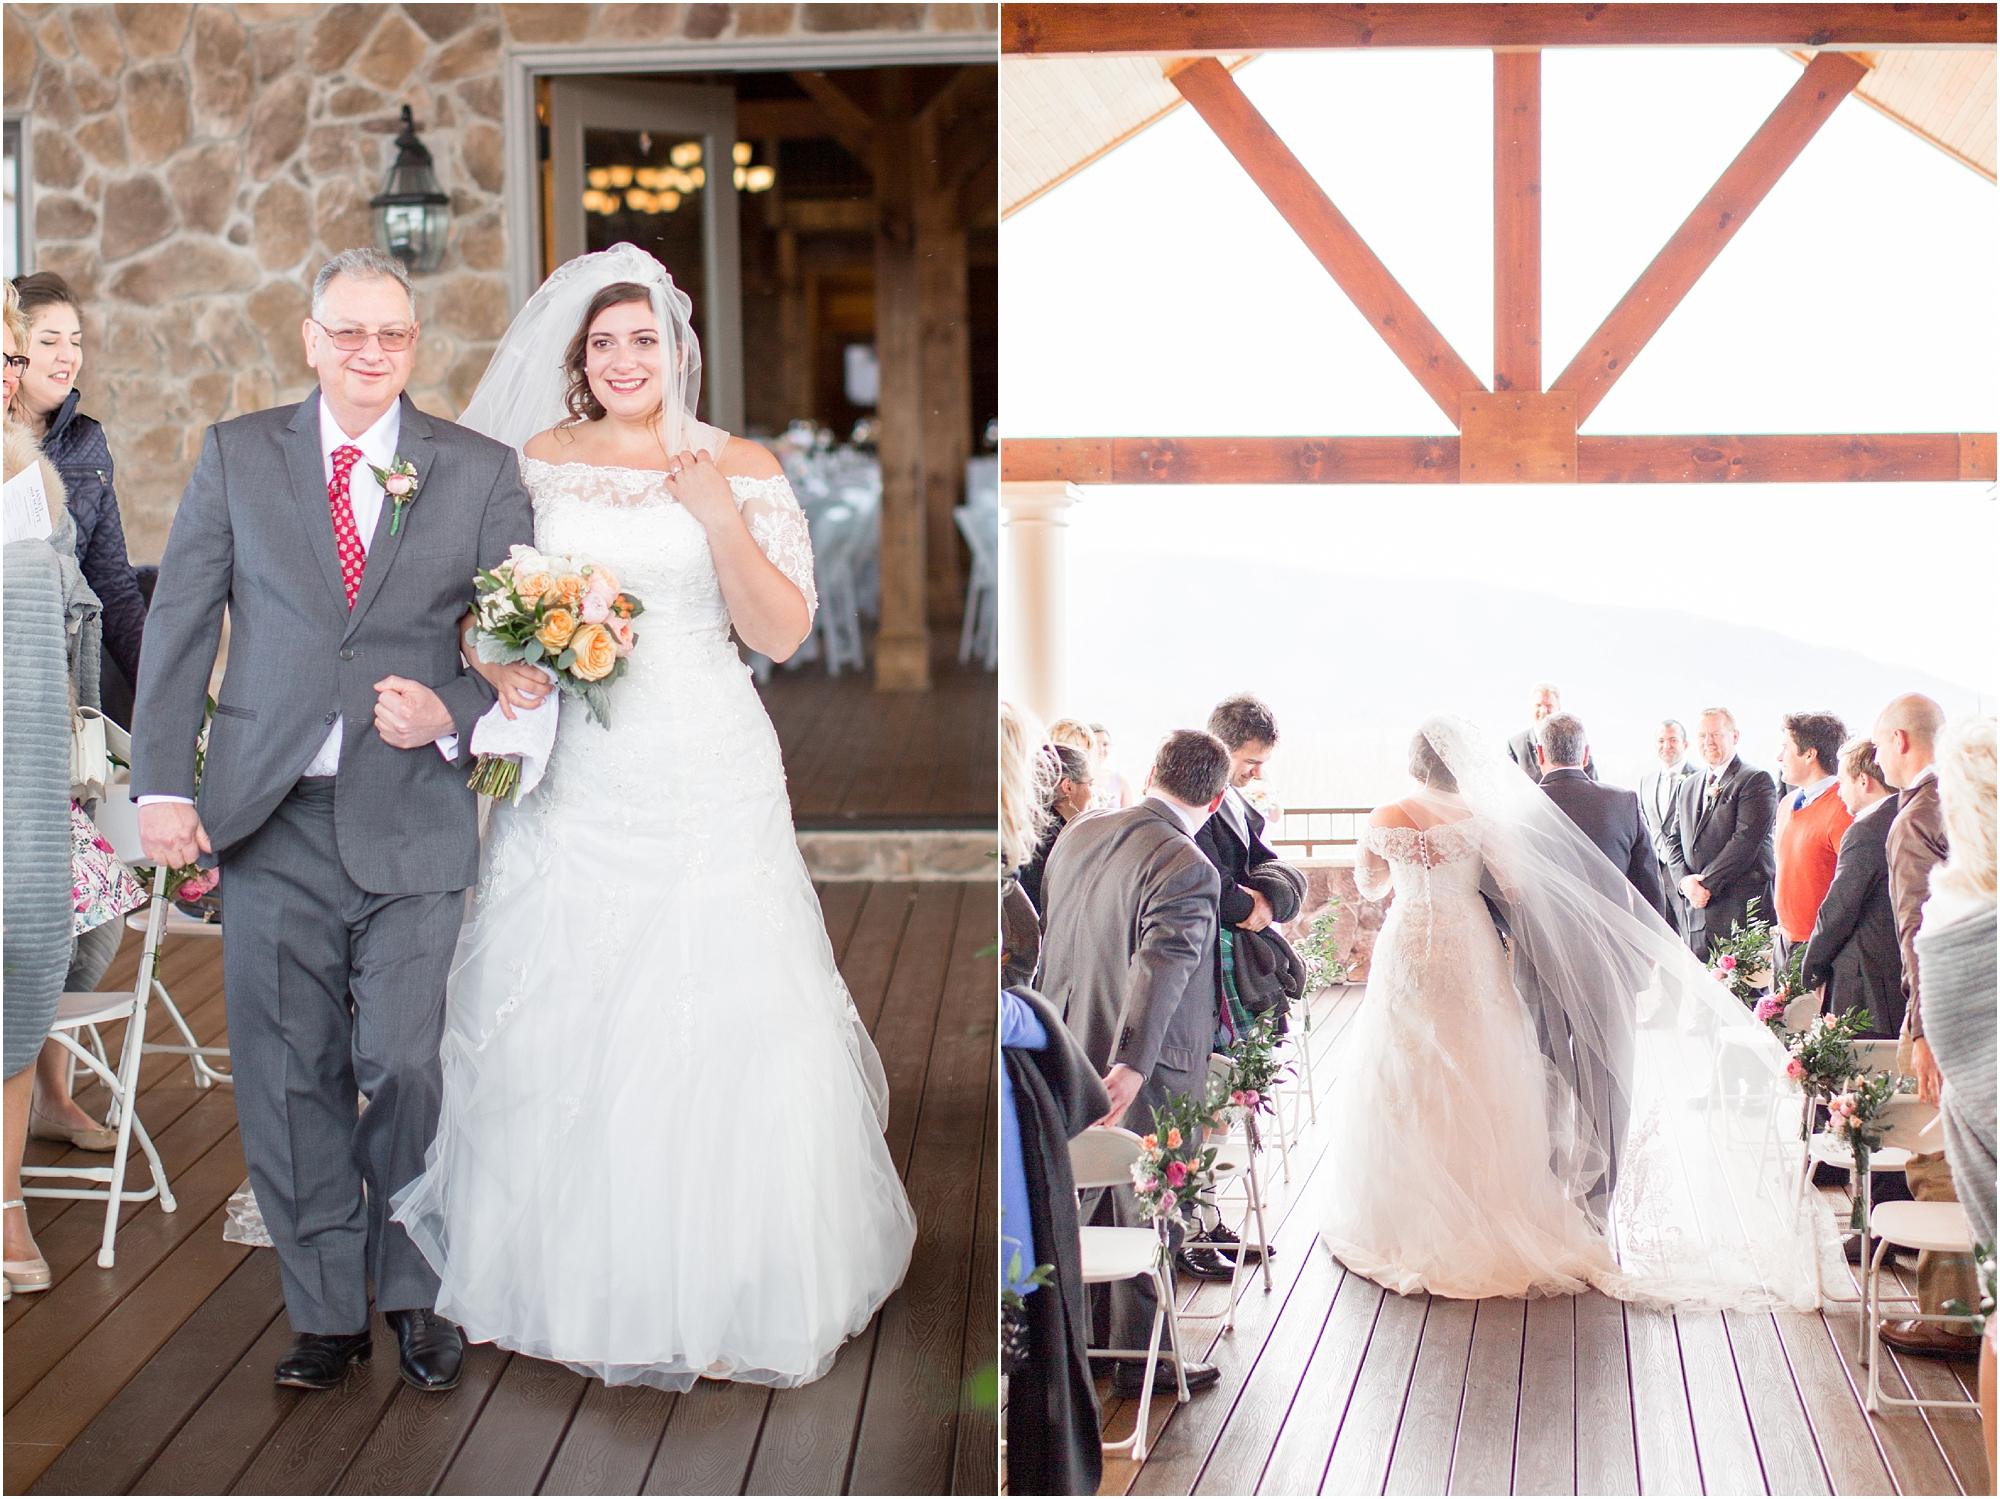 Simpson 4-Ceremony-604_anna grace photography virginia wedding photographer irvine estate photo.jpg